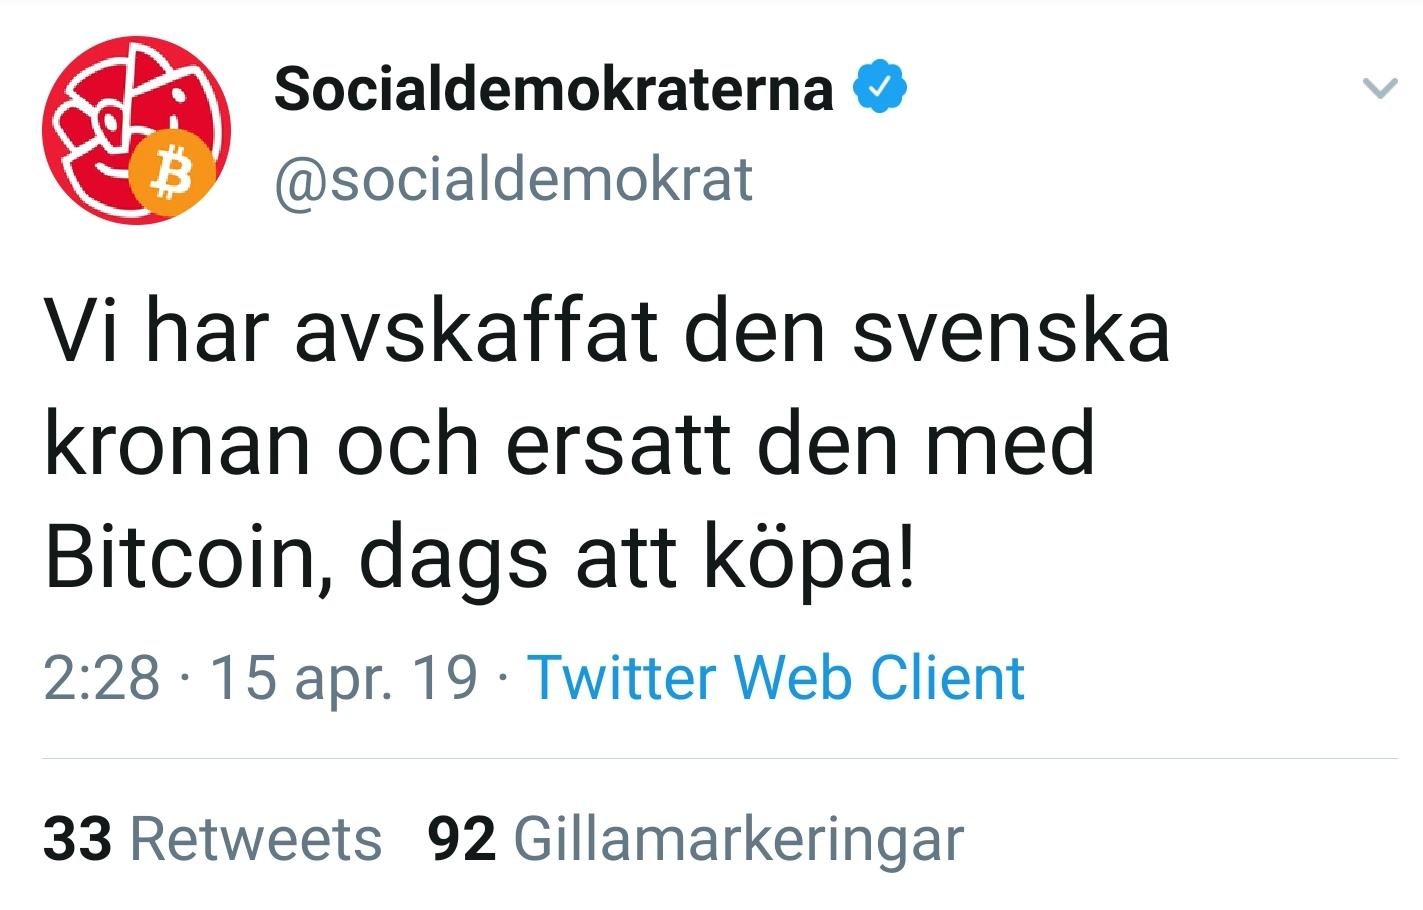 Socialdemokraternas Twitterkonto hackat.